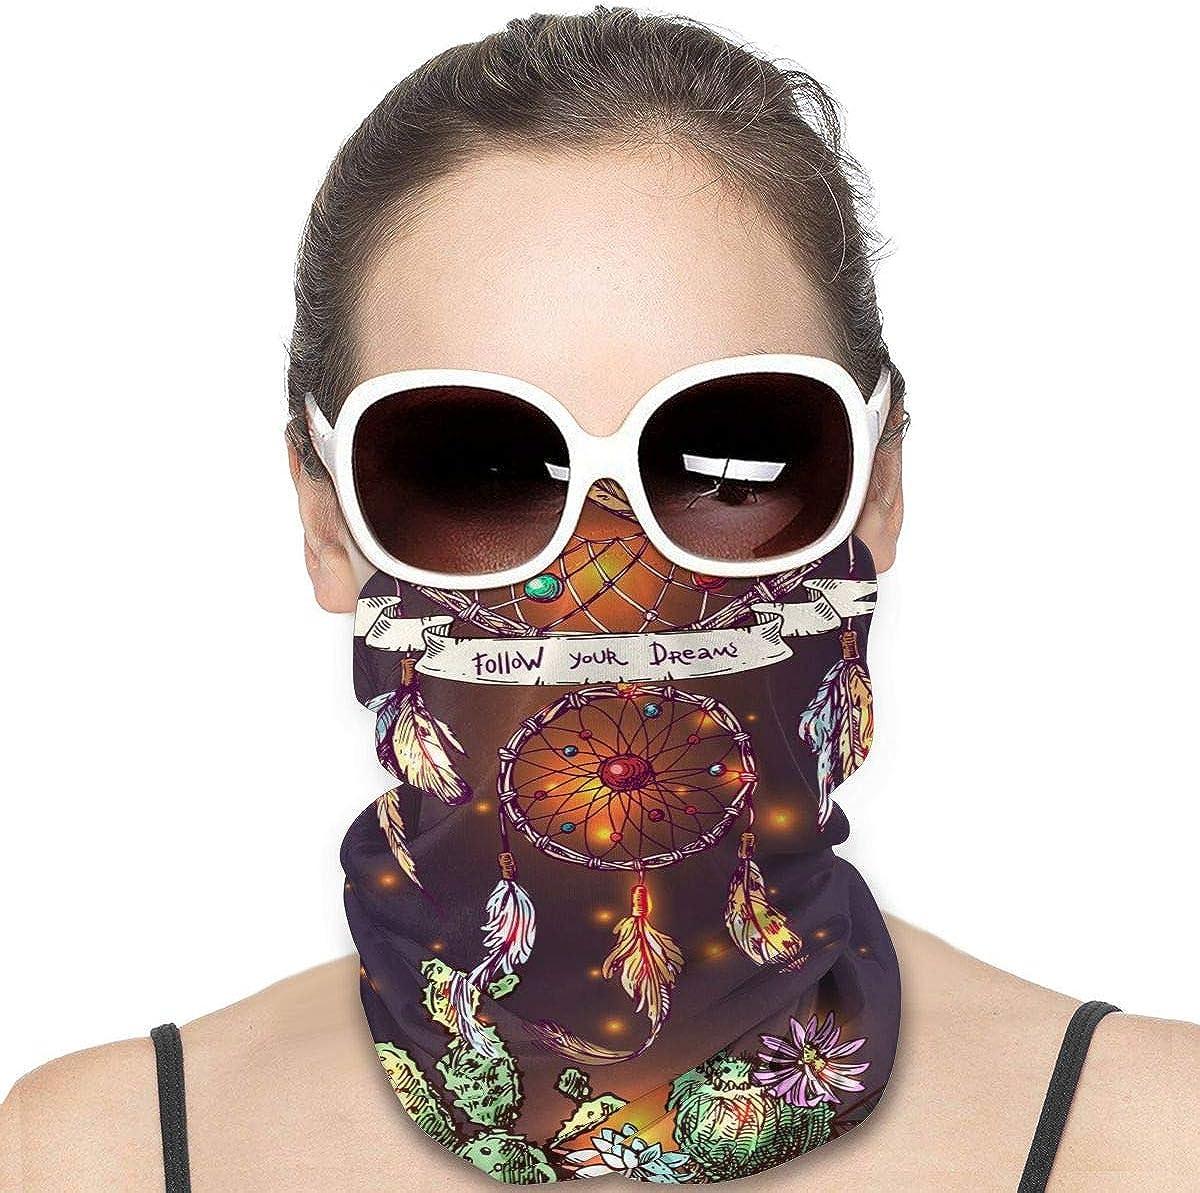 KiuLoam Women Bandanas Face Mask, Fantasy Dreamcatcher Neck Gaiter Mask Headband for Men Face Scarf Dust, Outdoors, Sports